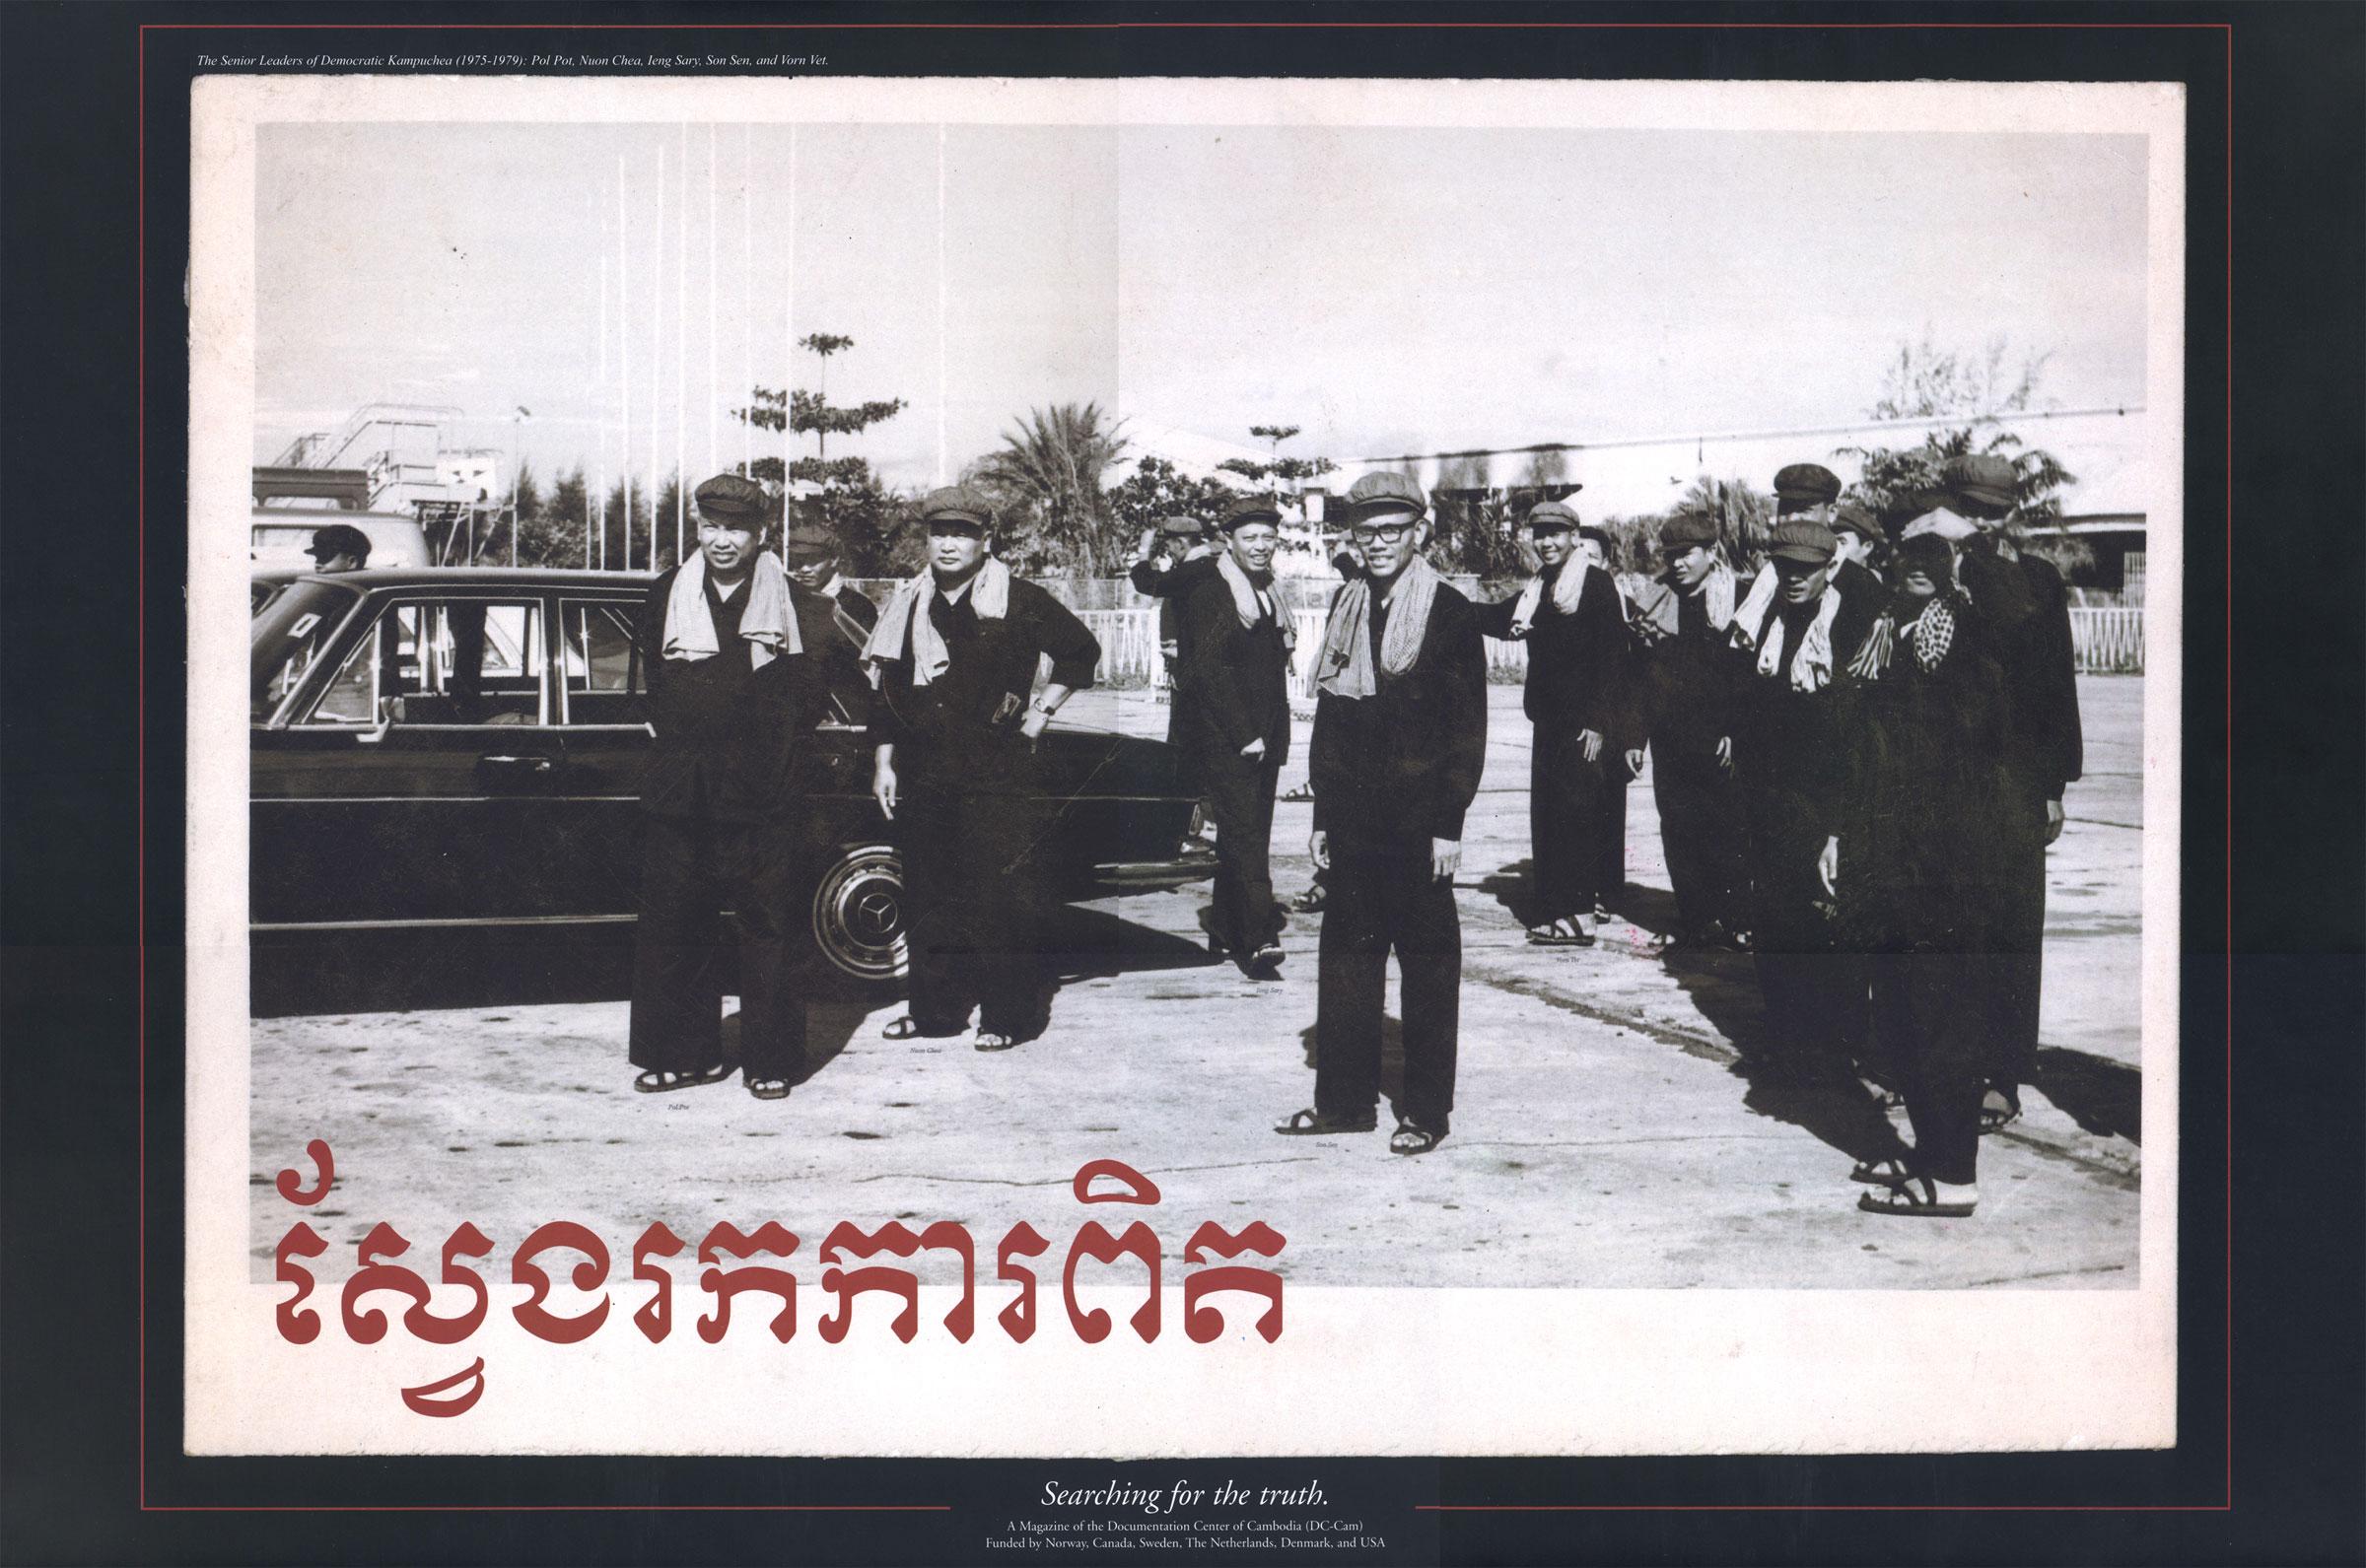 2000.-Khmer-Rouge-Leader-20001